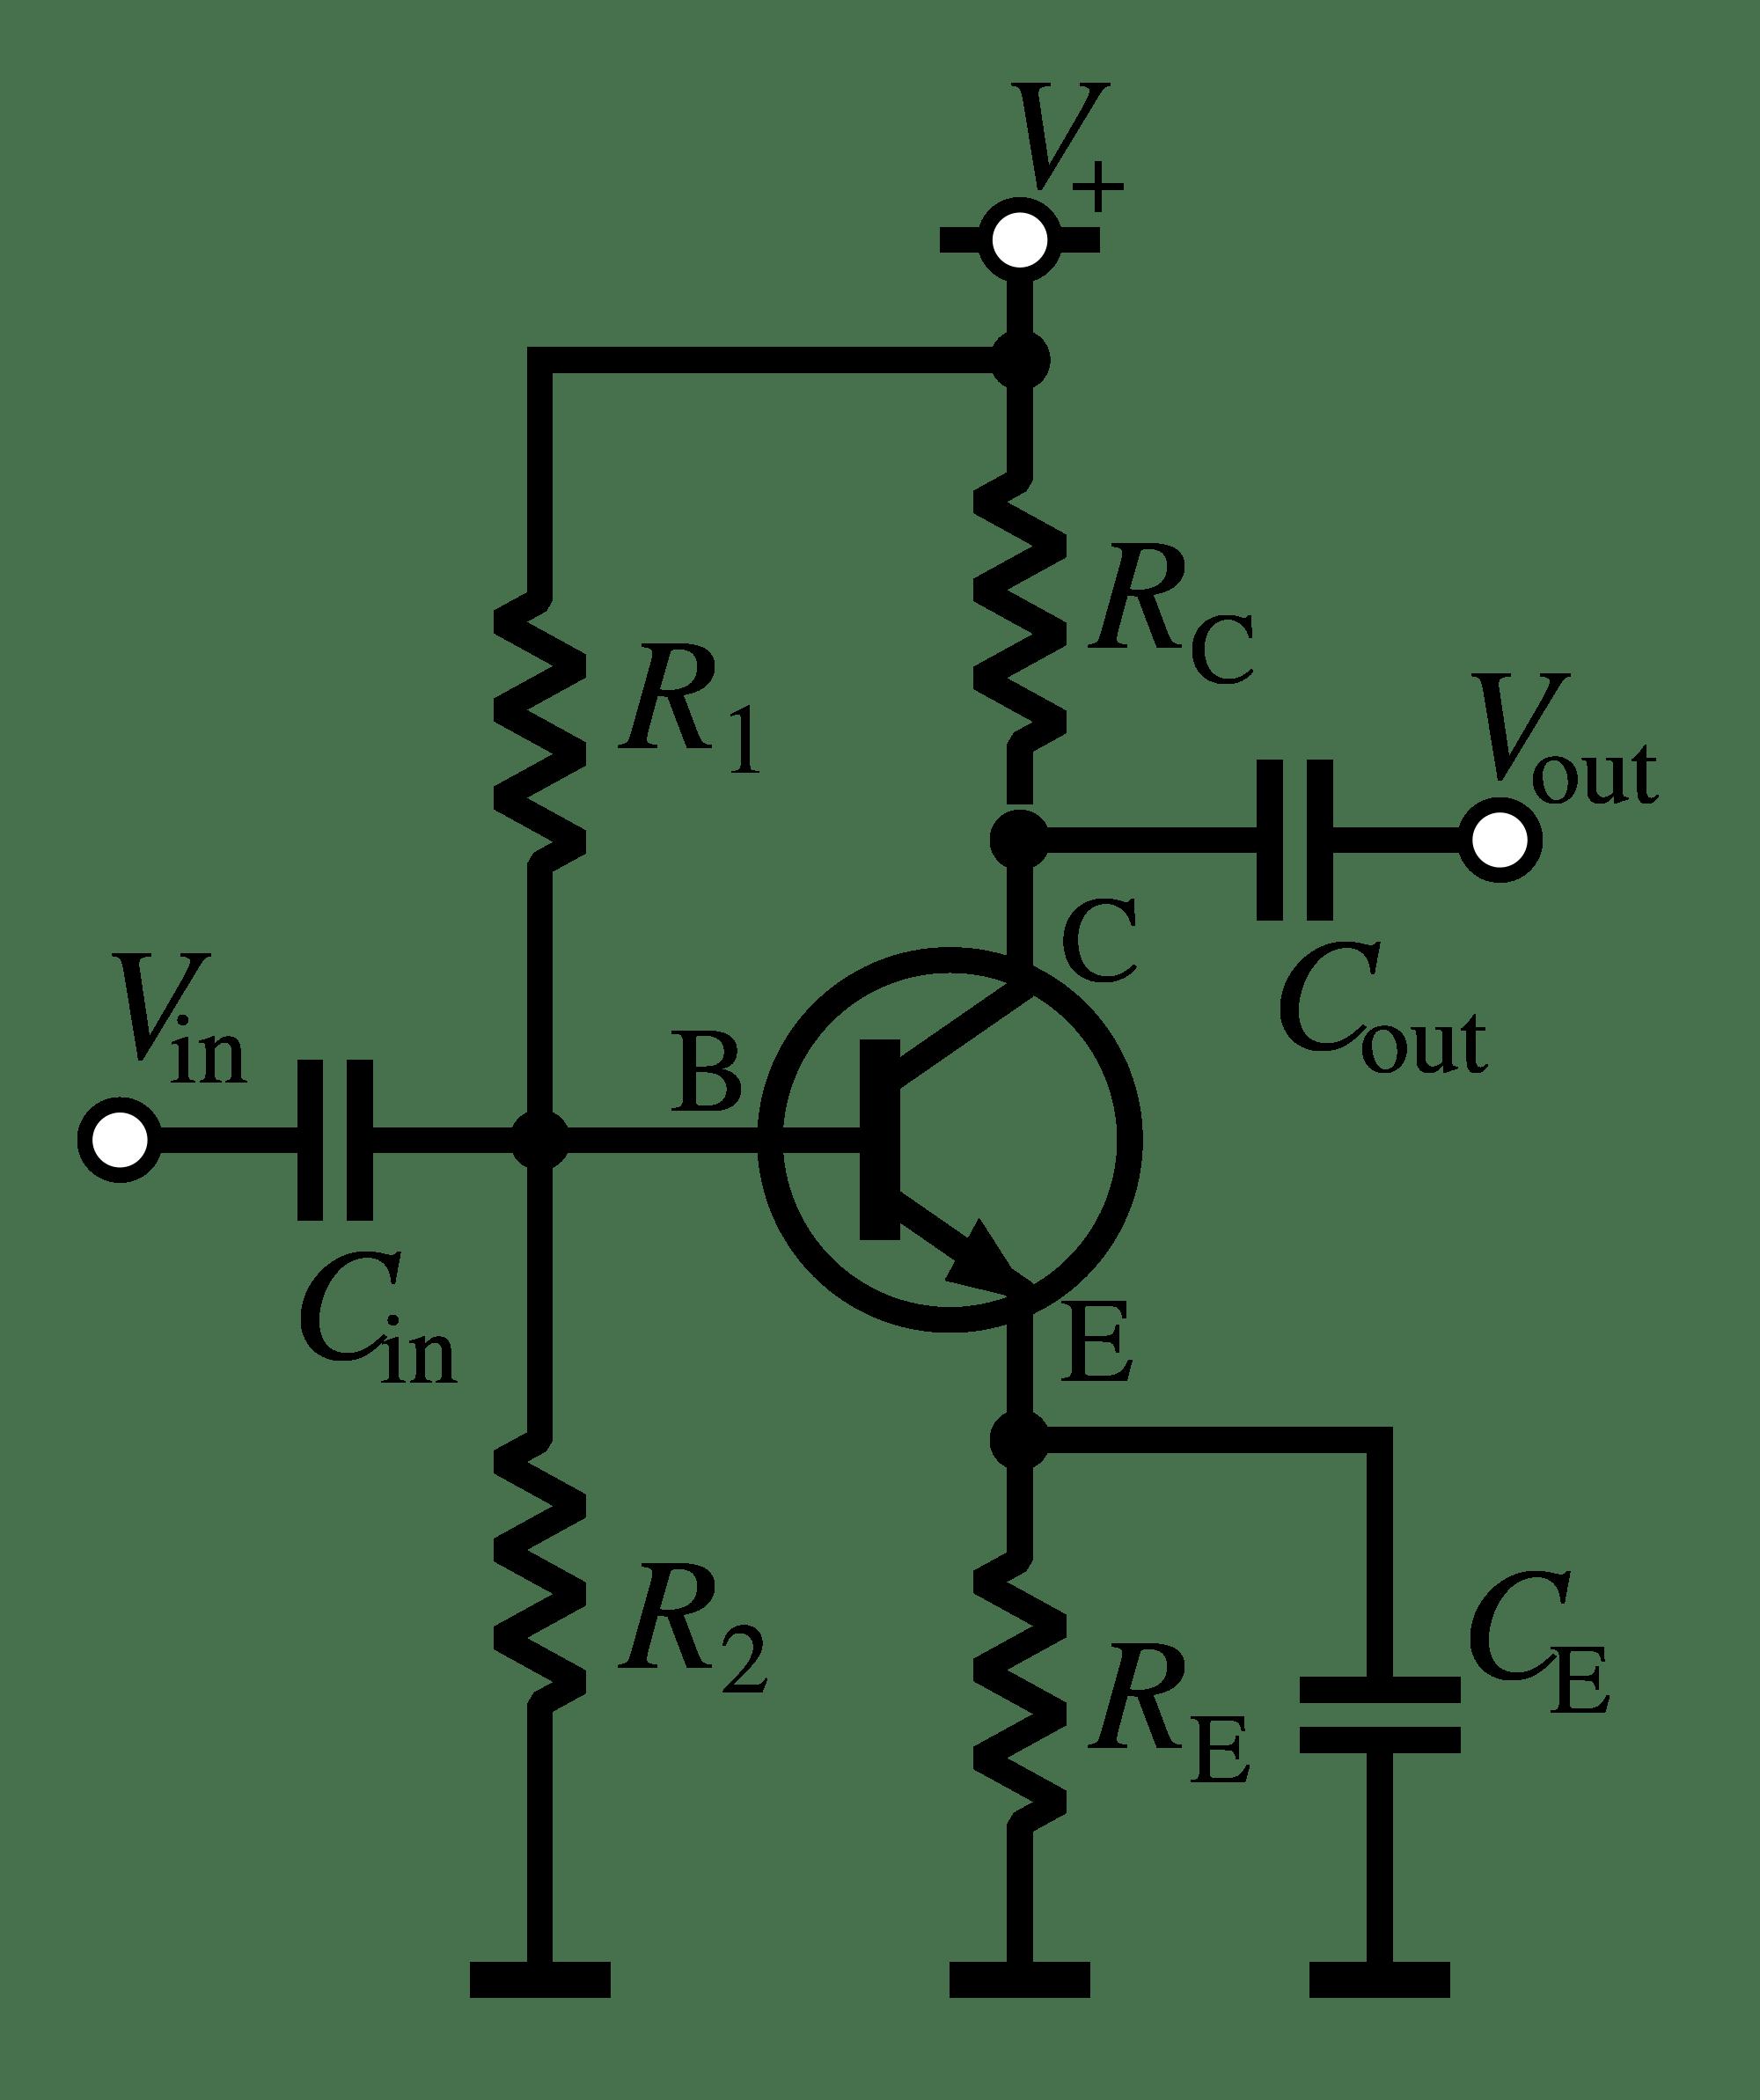 Transistor As An Amplifier Common Emitter Amplifier